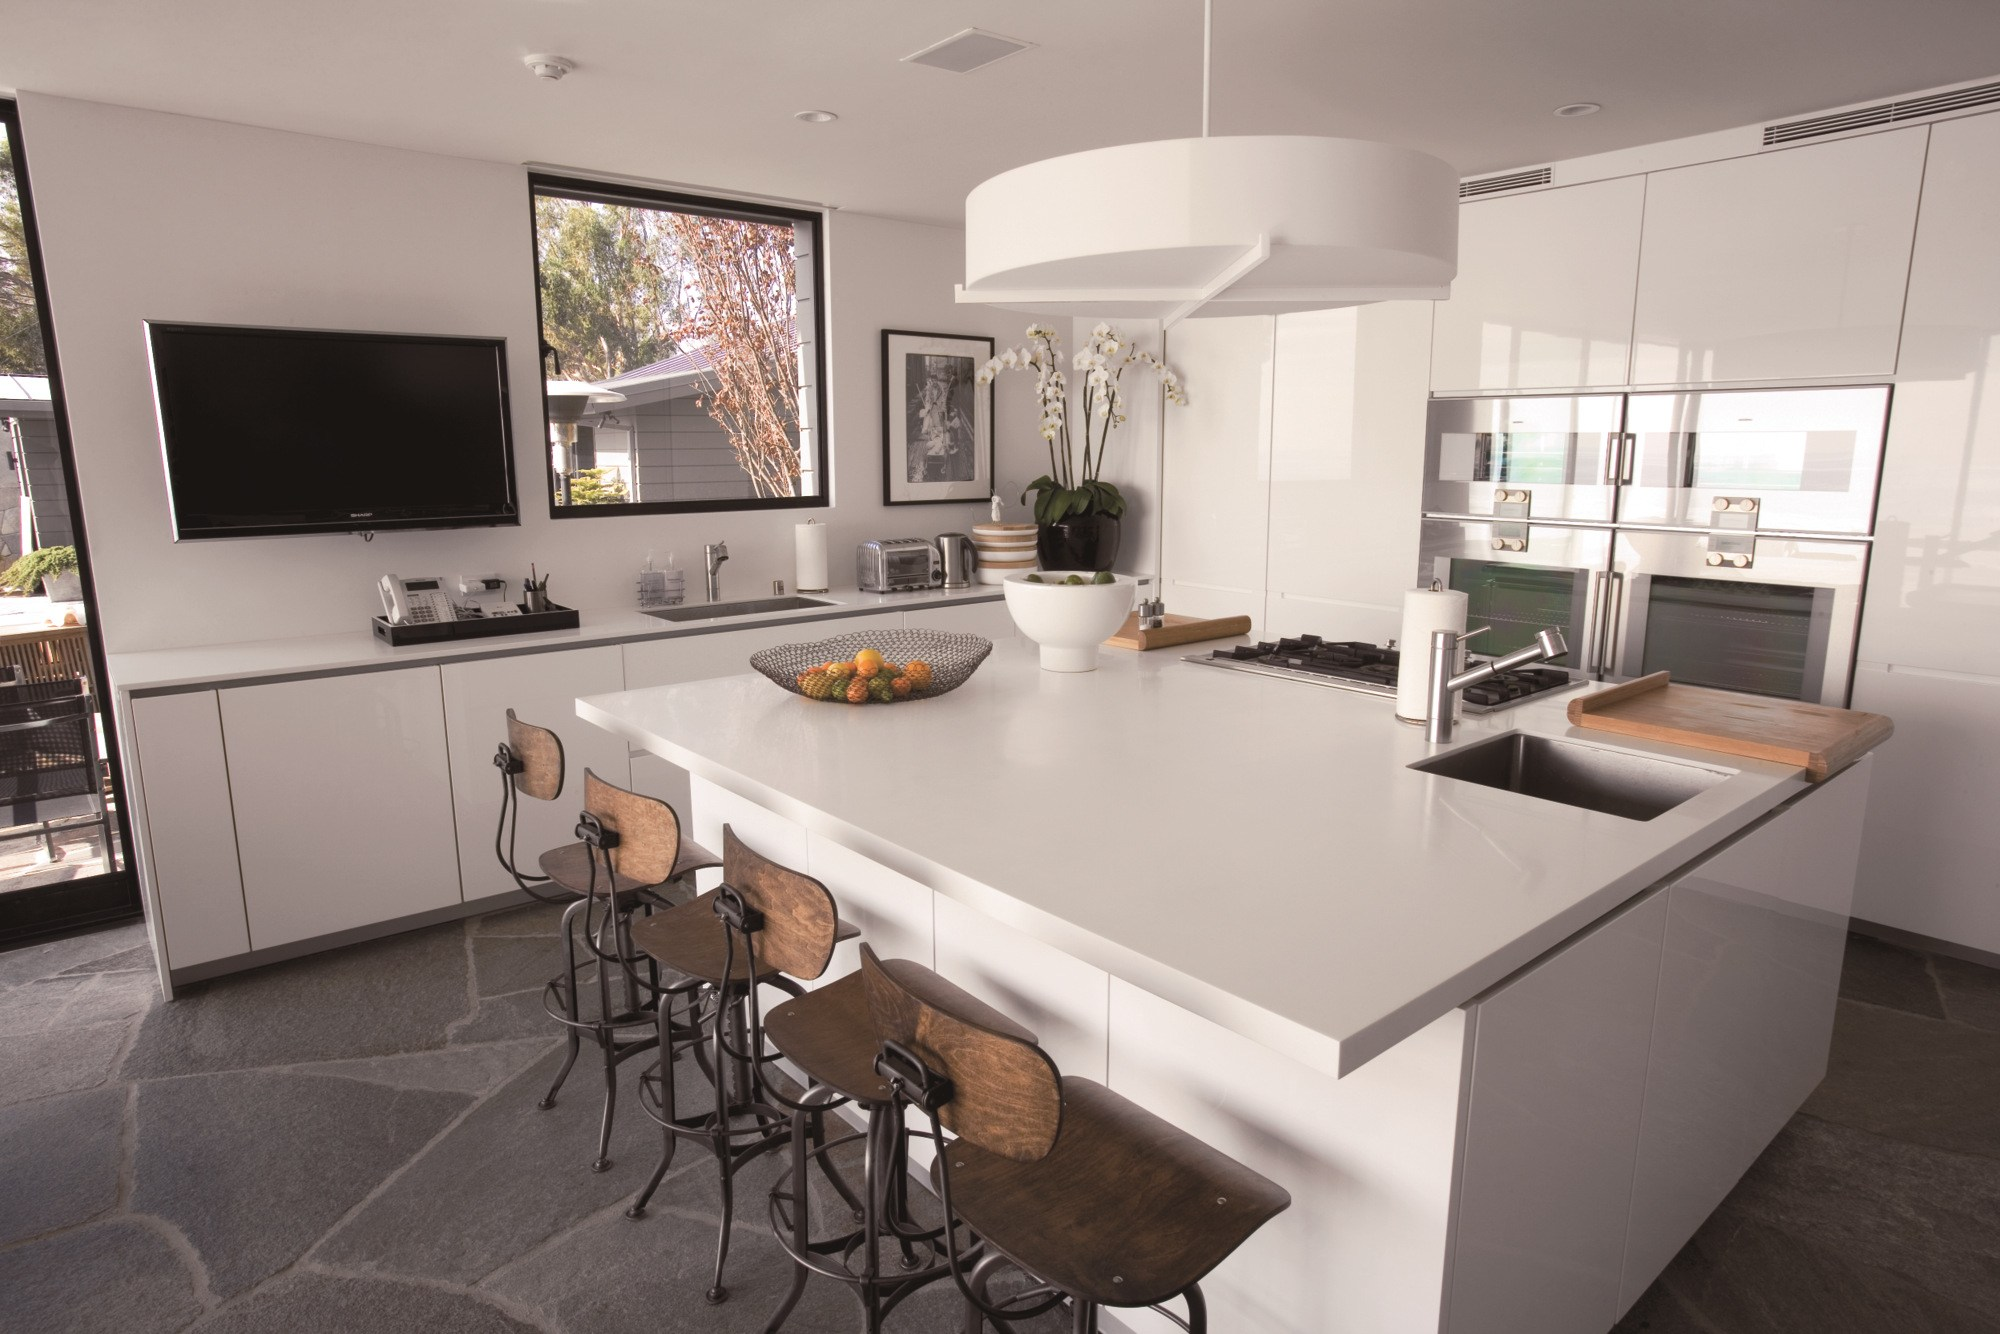 Cucine Bellissime Con Isola del tongo cucine. amalfi del tongo. cucina moderna in